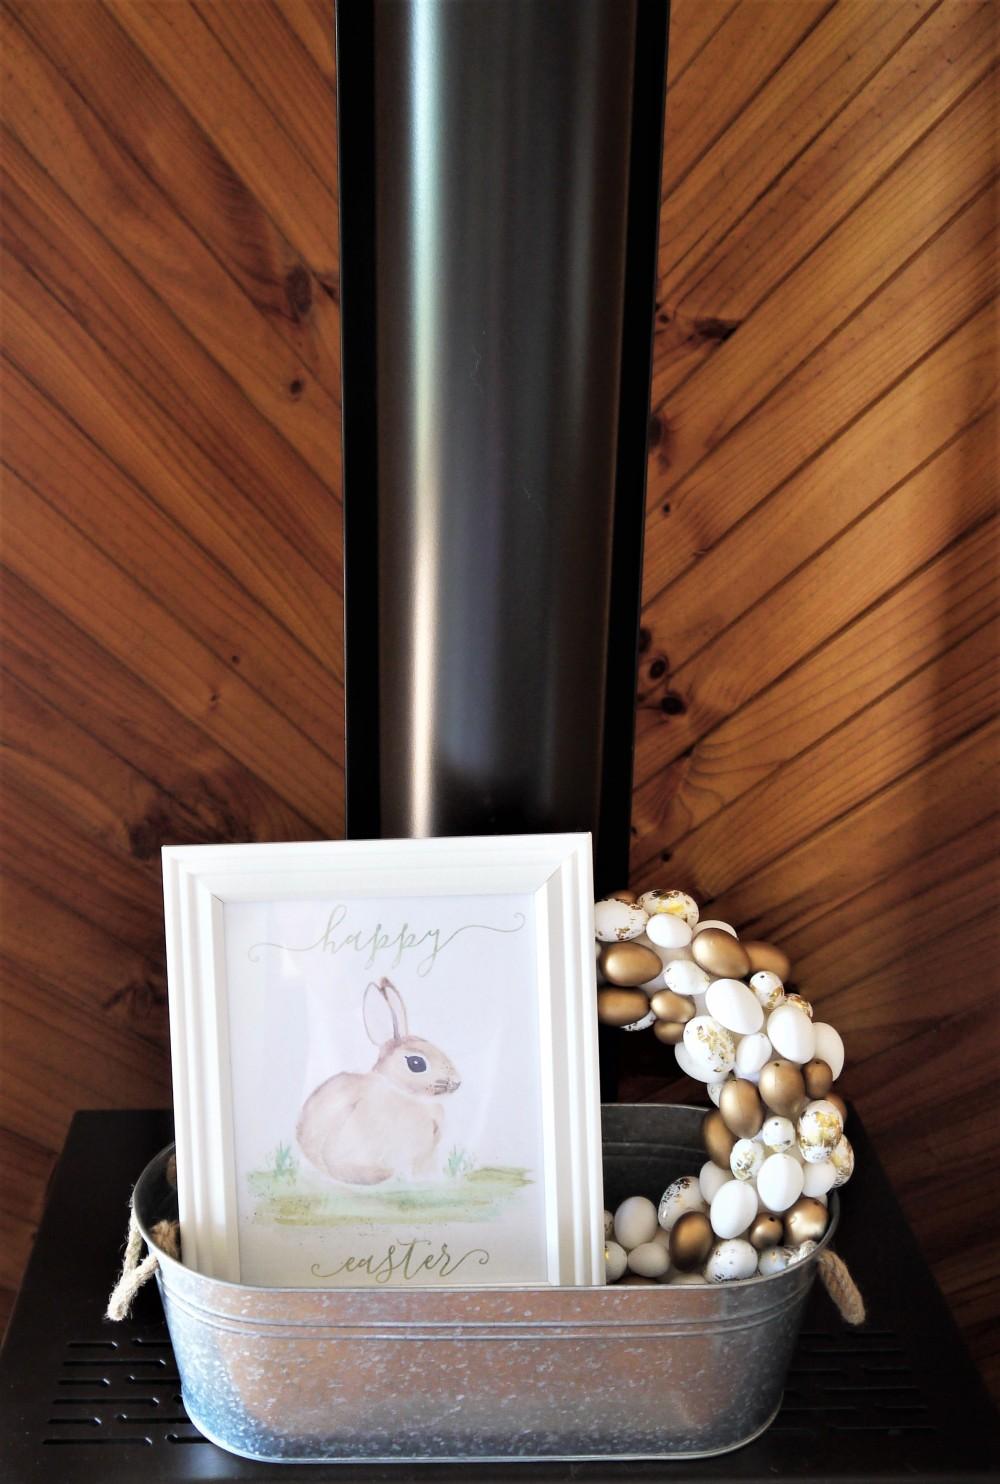 Easter-mantel-decor